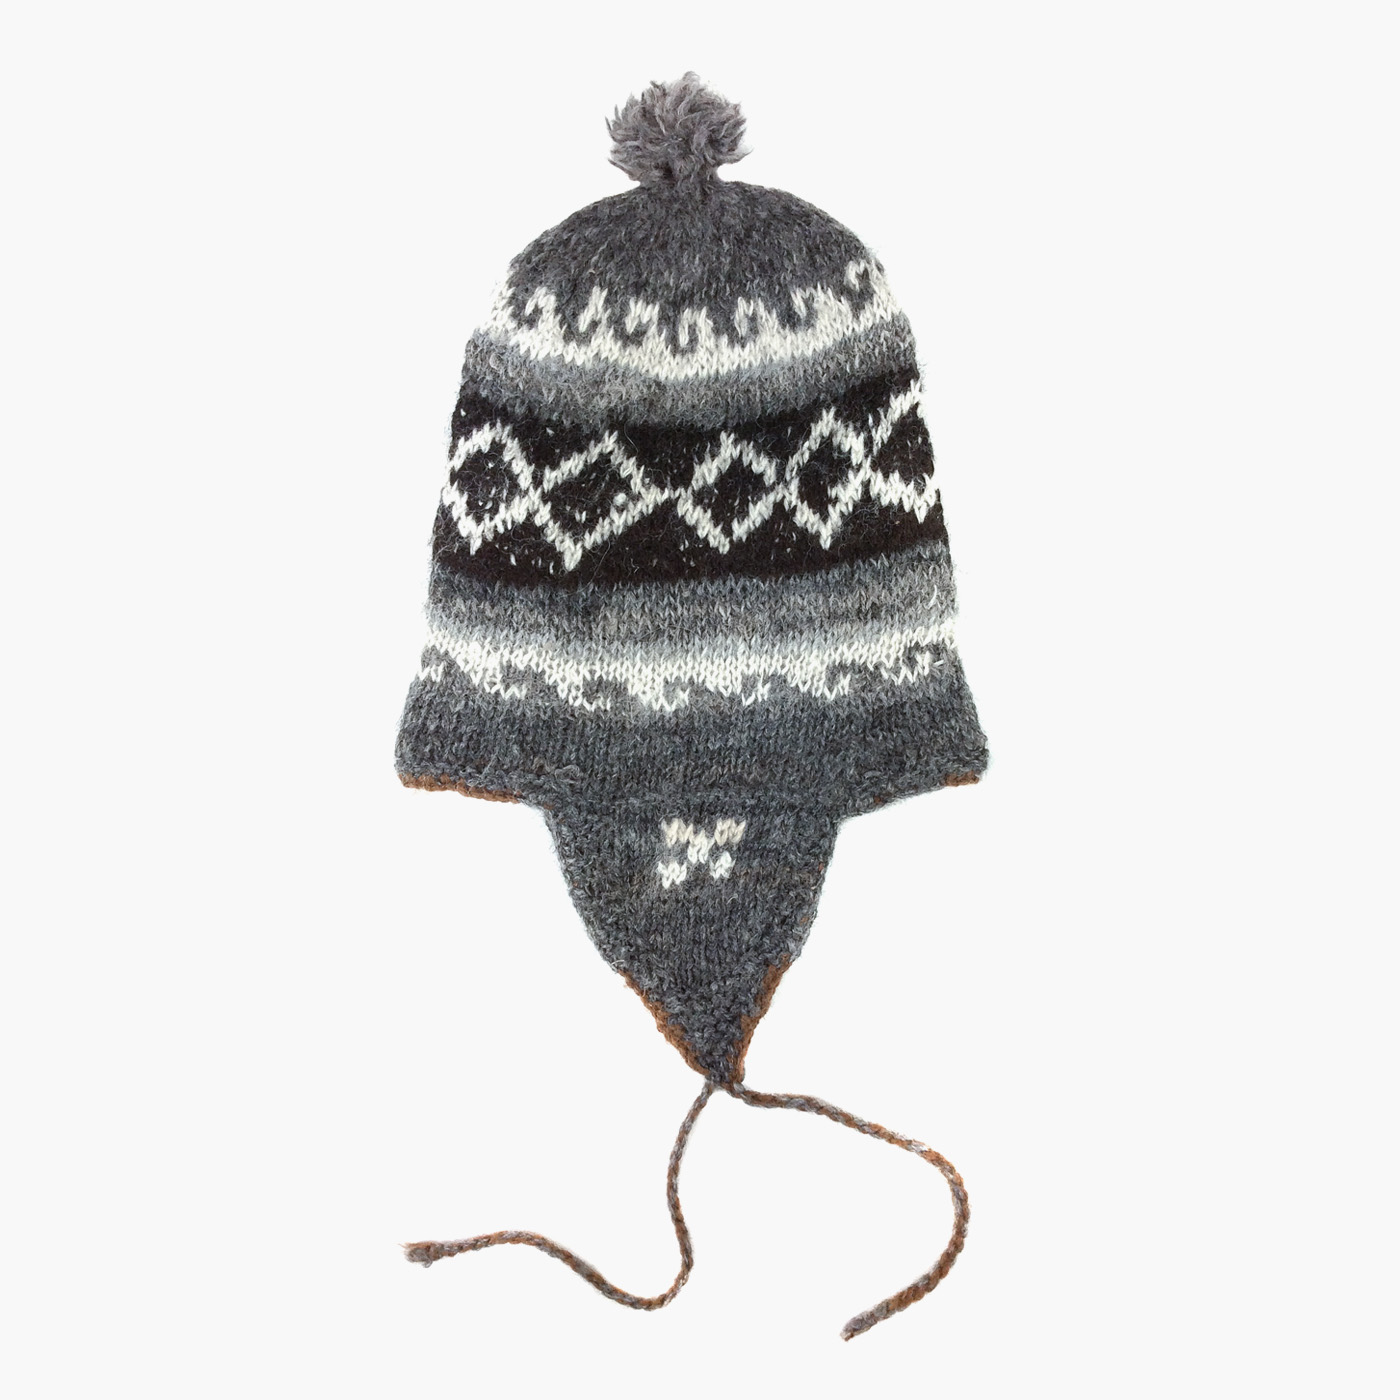 3695e4d7181 Dark Grey 100% Alpaca Wool Hand Knitted Peruvian Hat